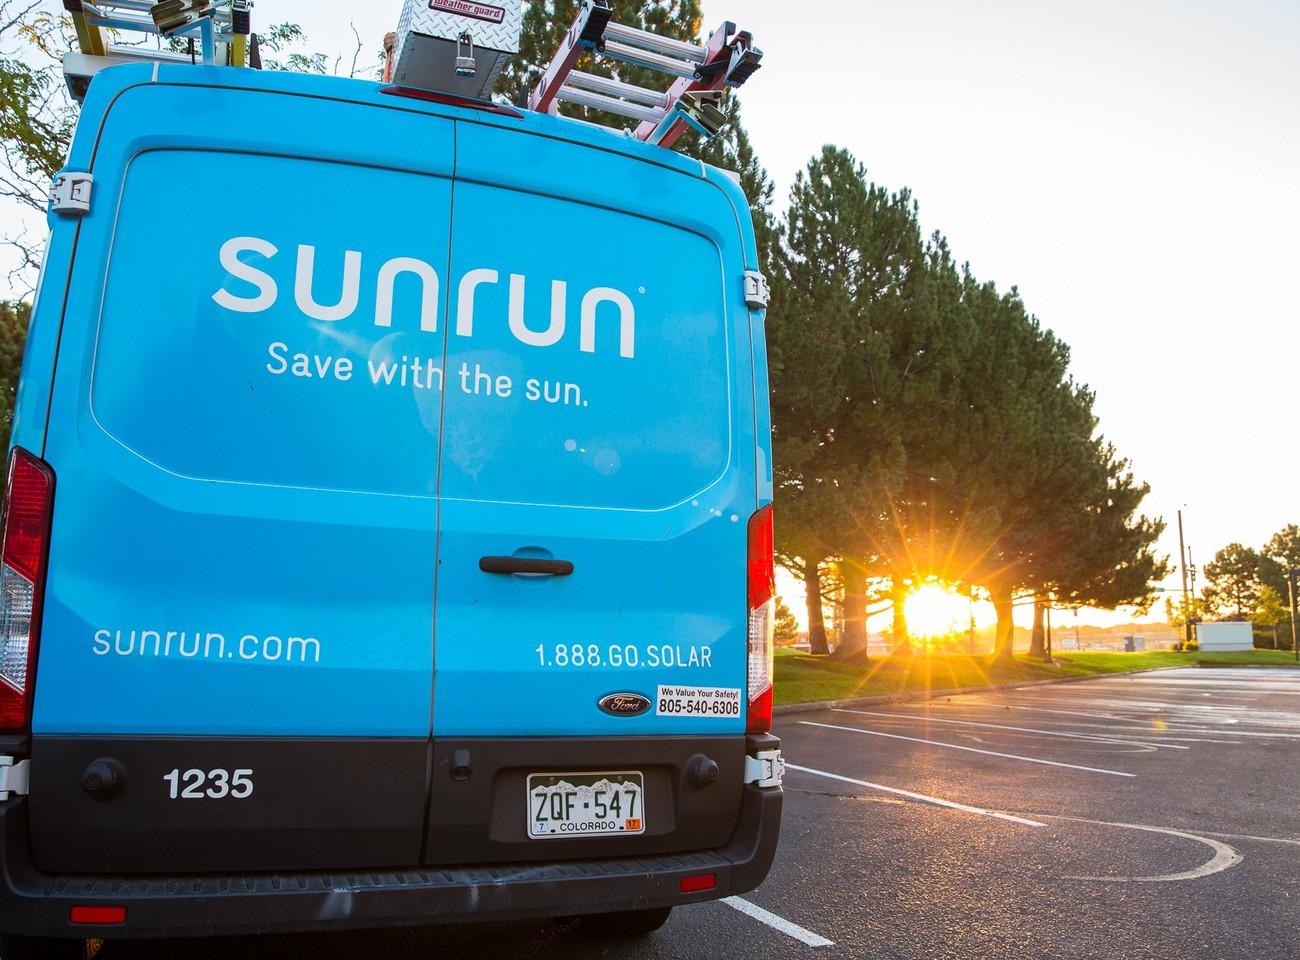 Sunrun Careers